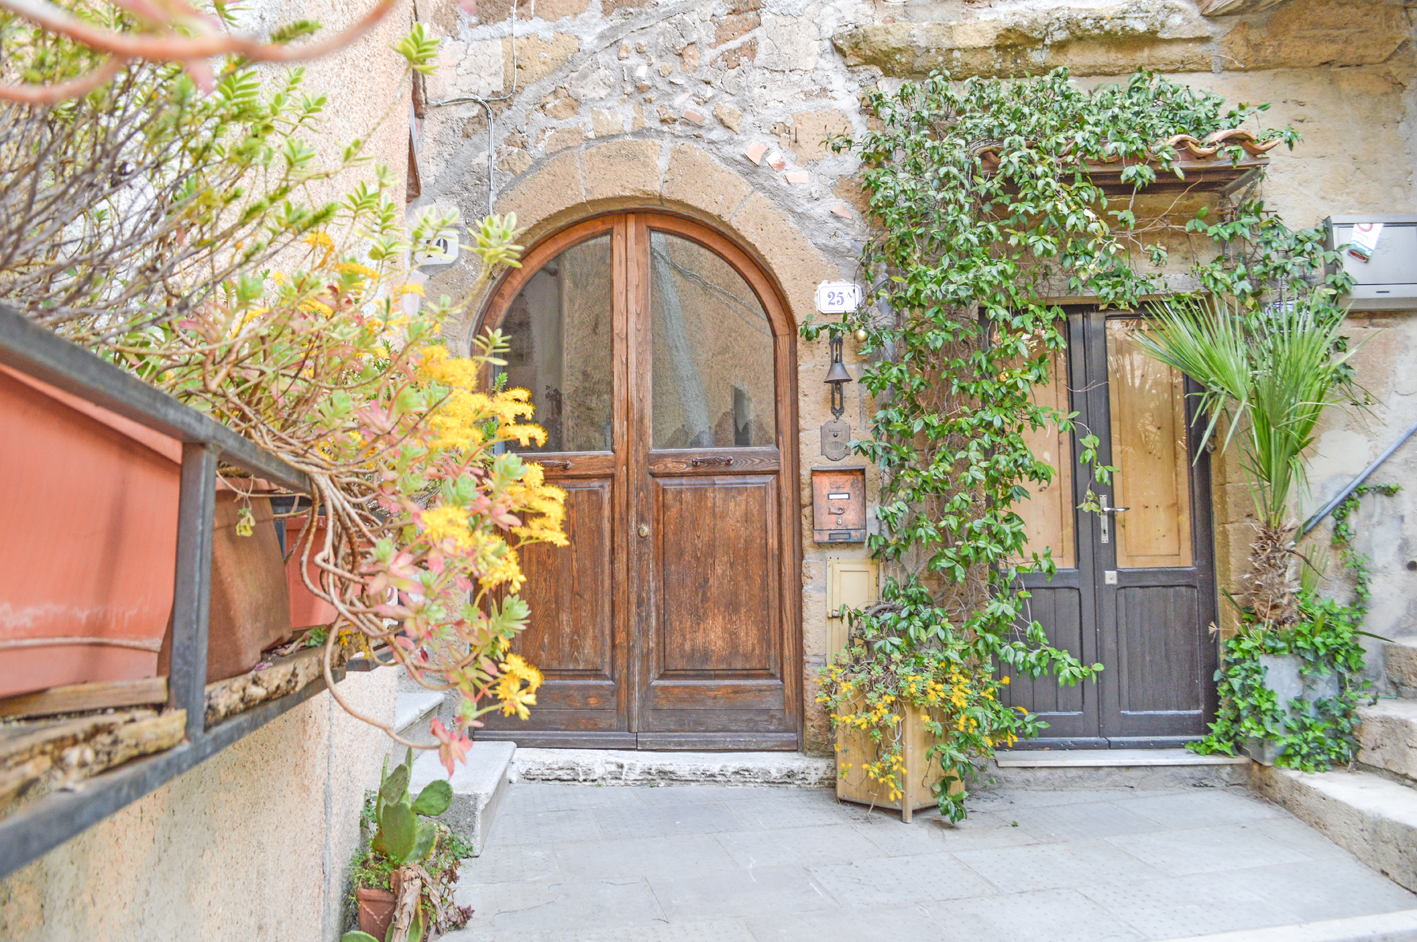 181 #WhereToGo: Pitigliano (Toscana)